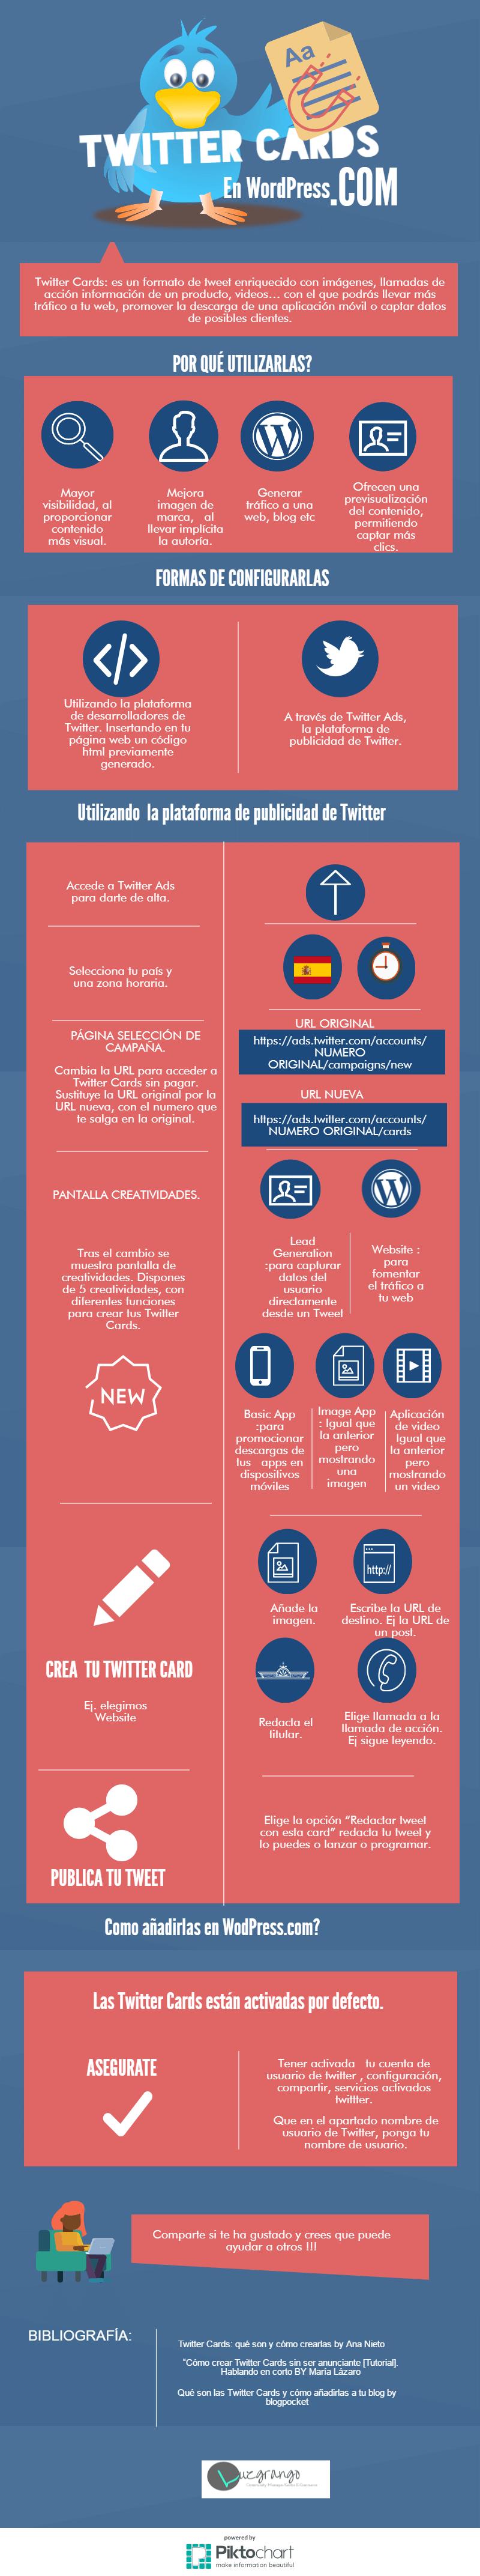 Twitter Cards en WordPress.com #infografia #infographic #socialmedia